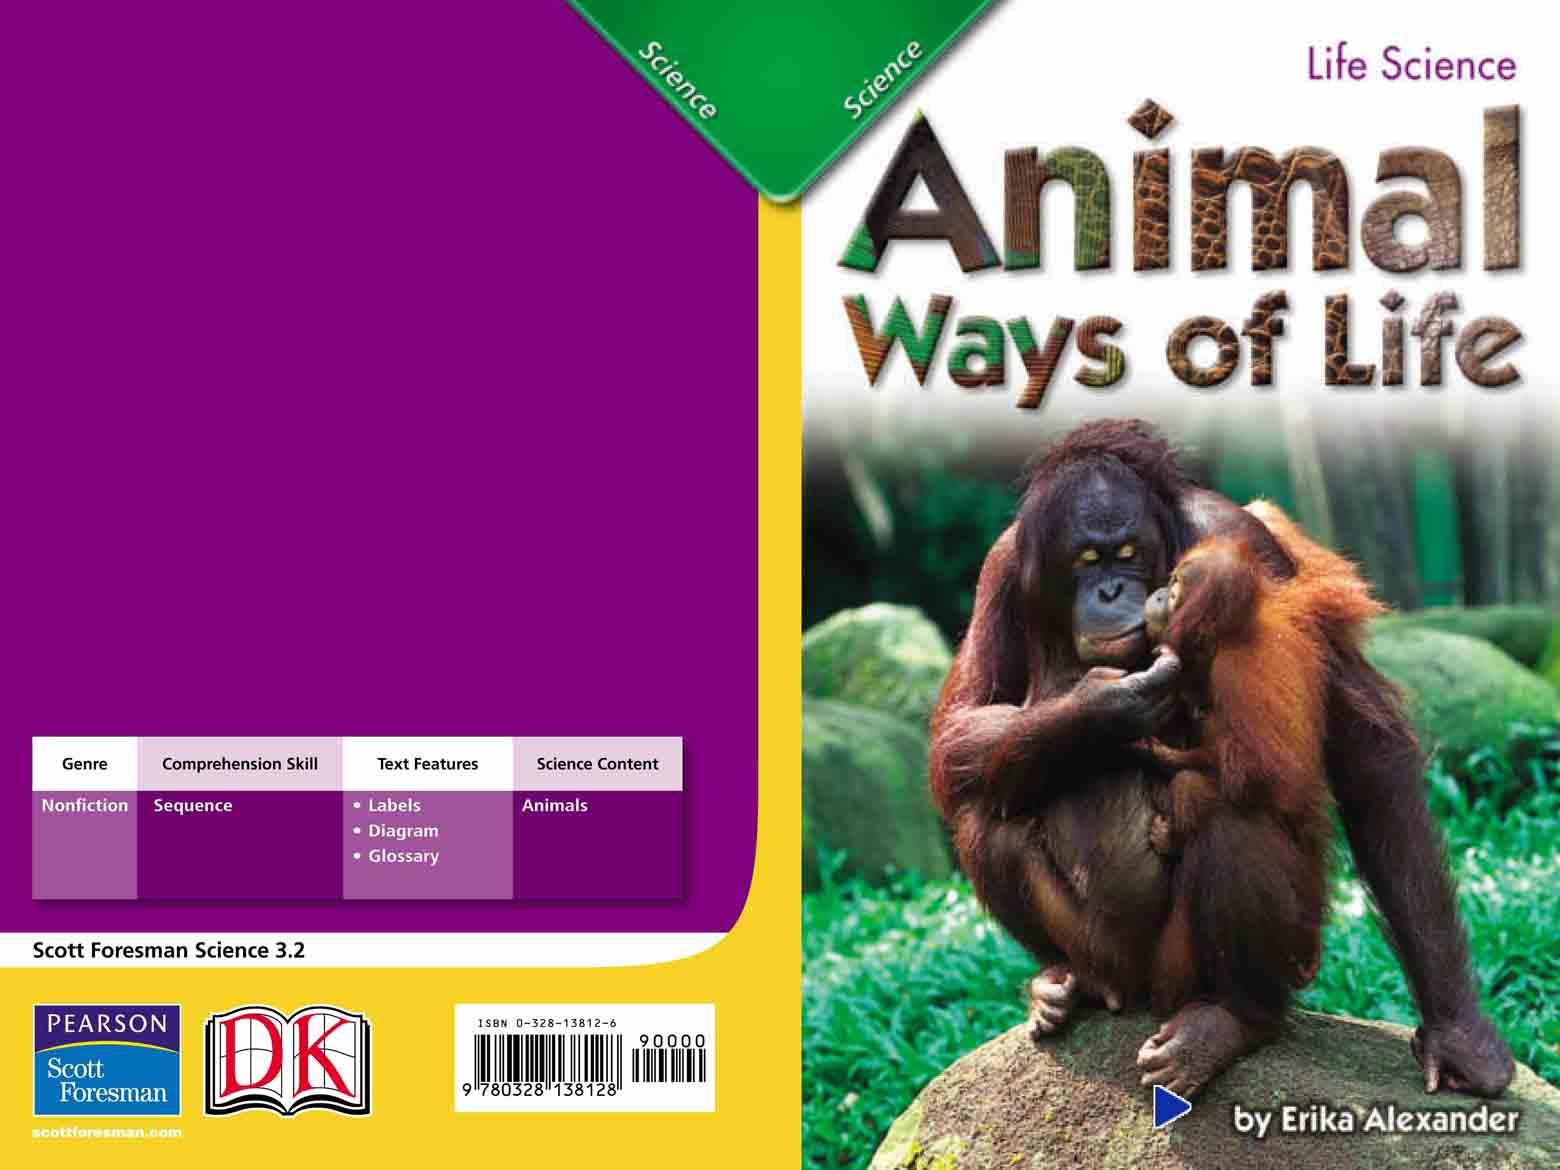 http://uupload.ir/files/4sgl_animal_ways_of_life_(m)-1.jpg